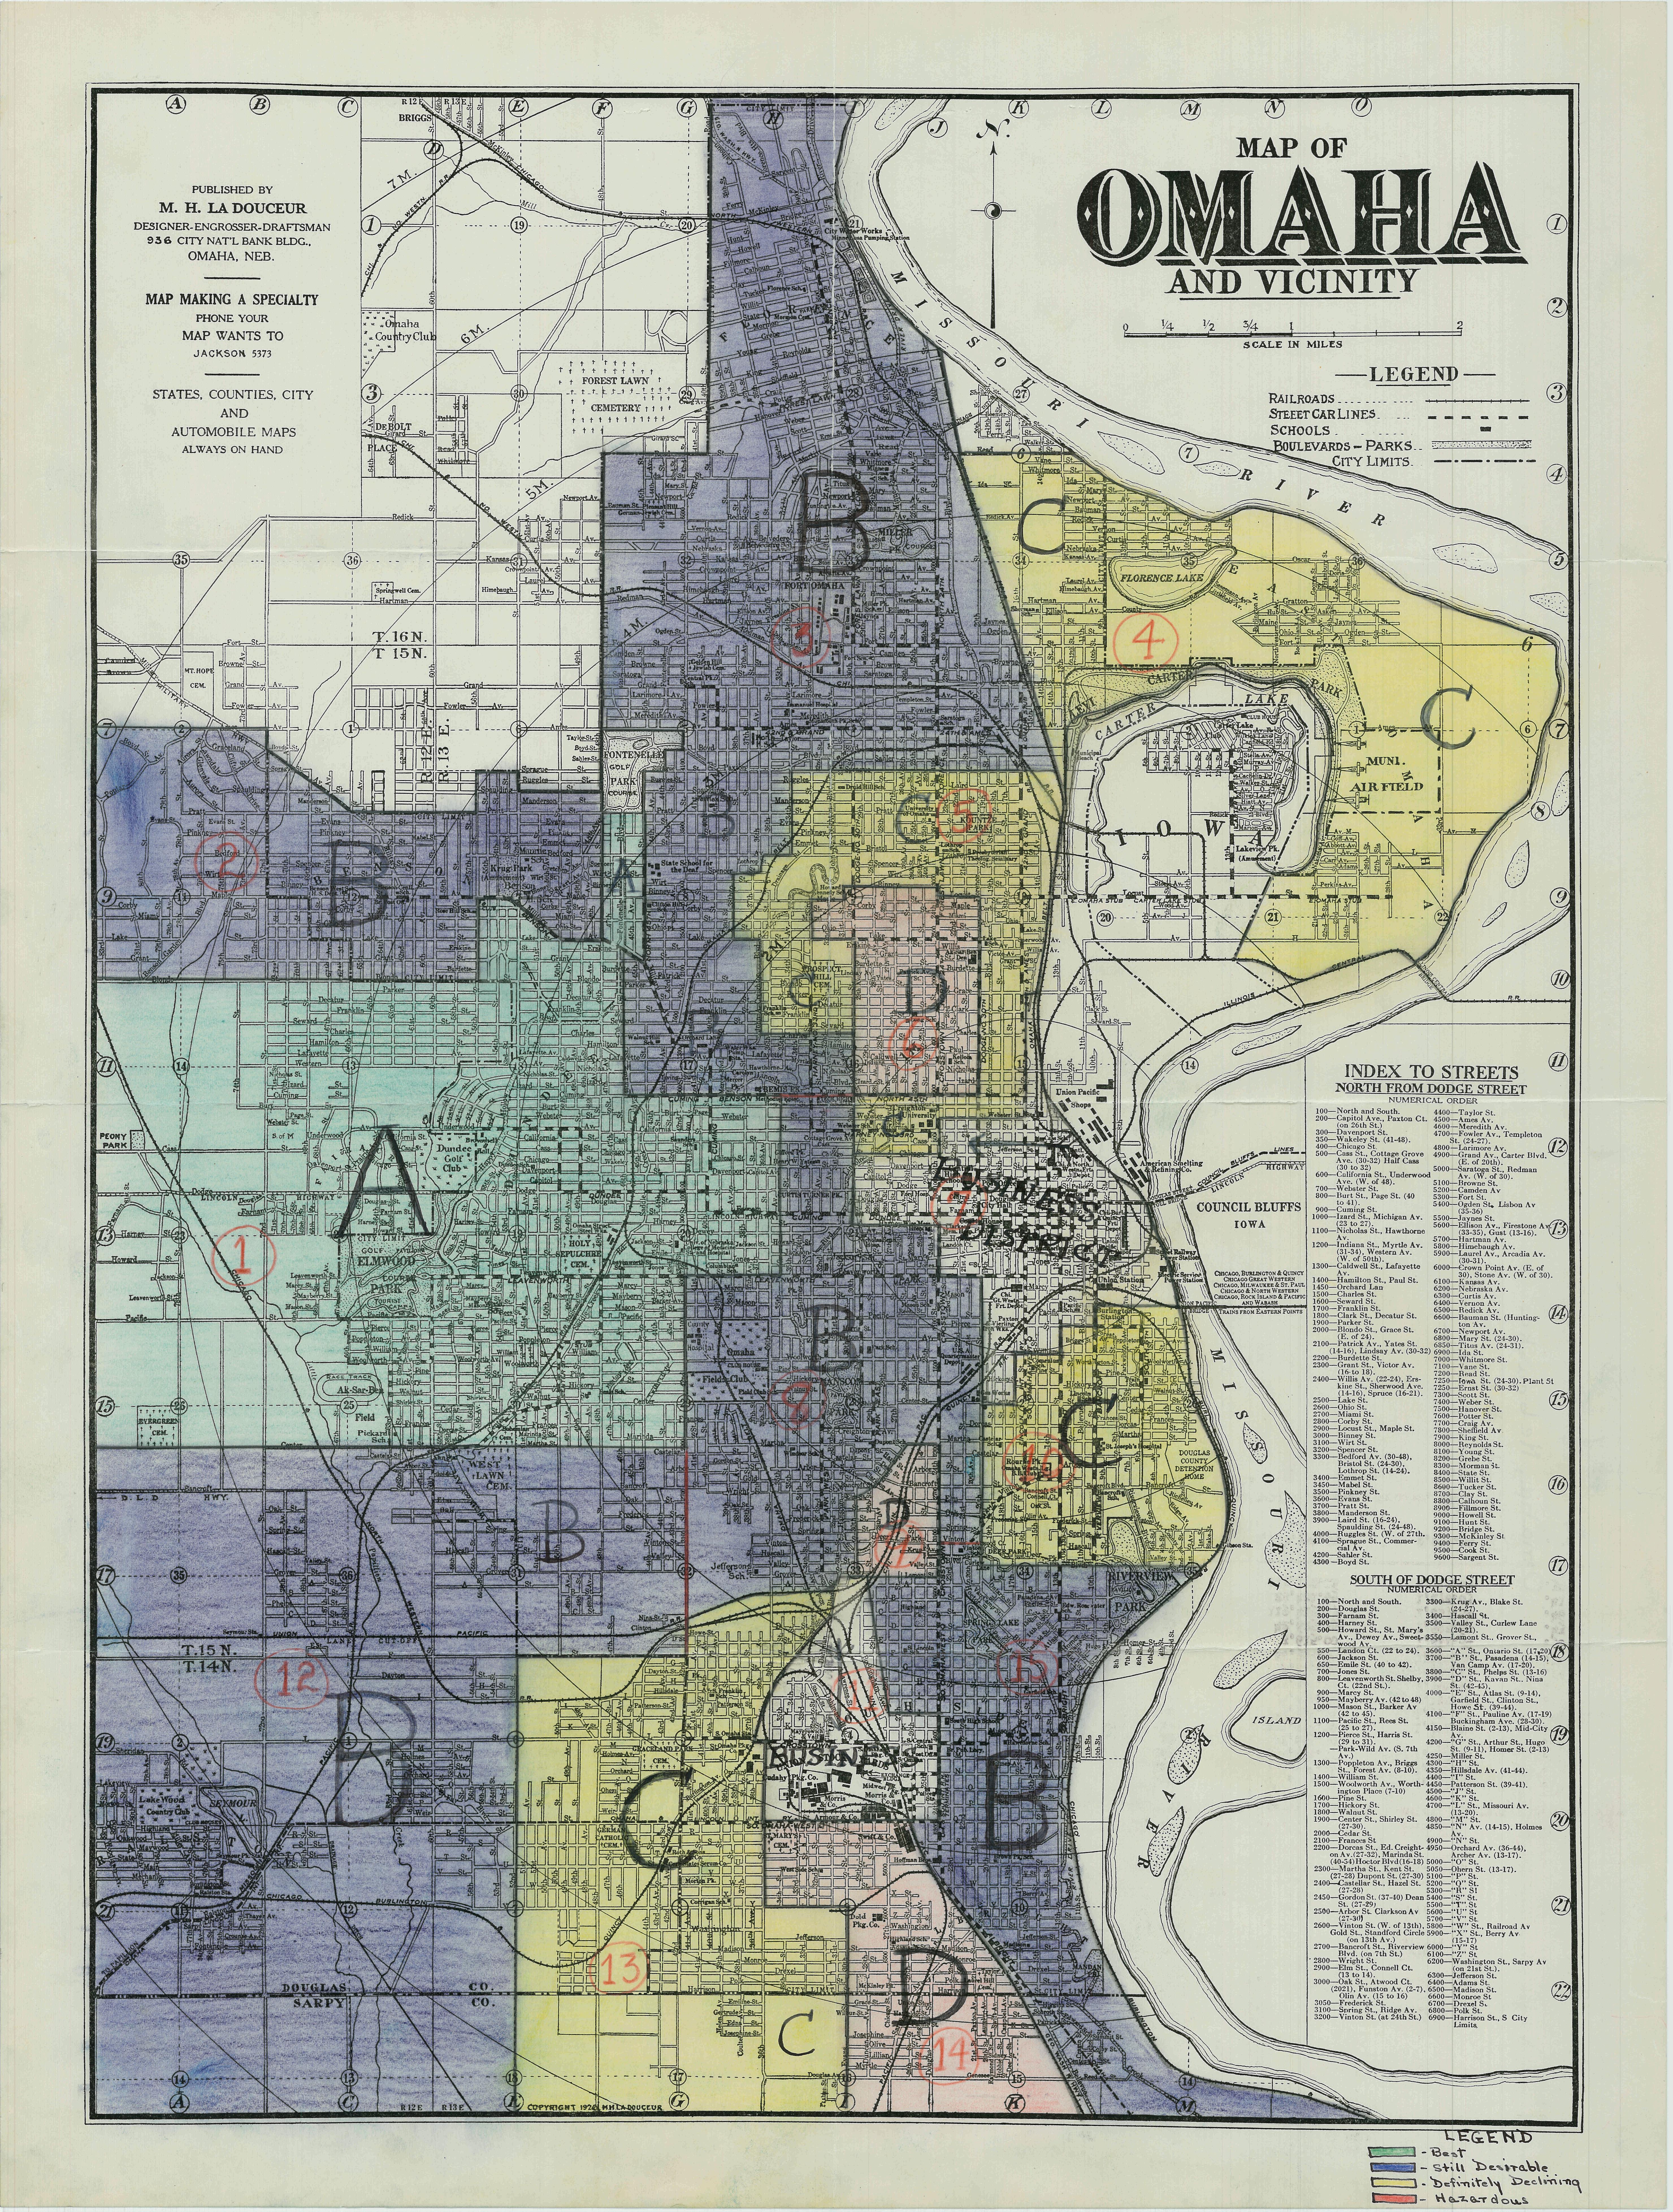 A History of Redlining in Omaha North Omaha History